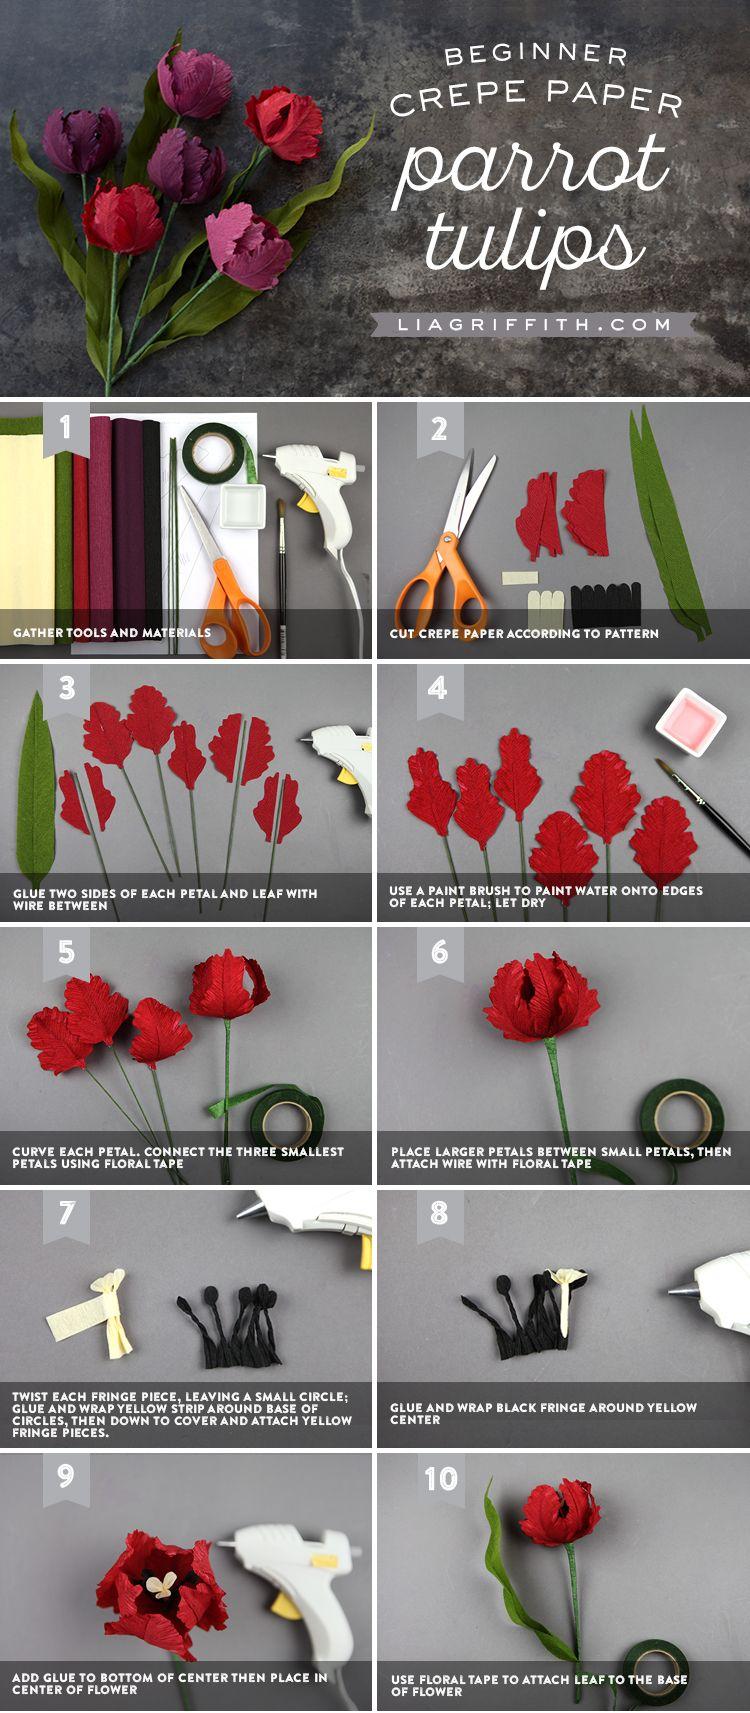 Diy Crepe Paper Parrot Tulips For Beginners Paper Flowers Paper Flowers Diy Tissue Paper Flowers